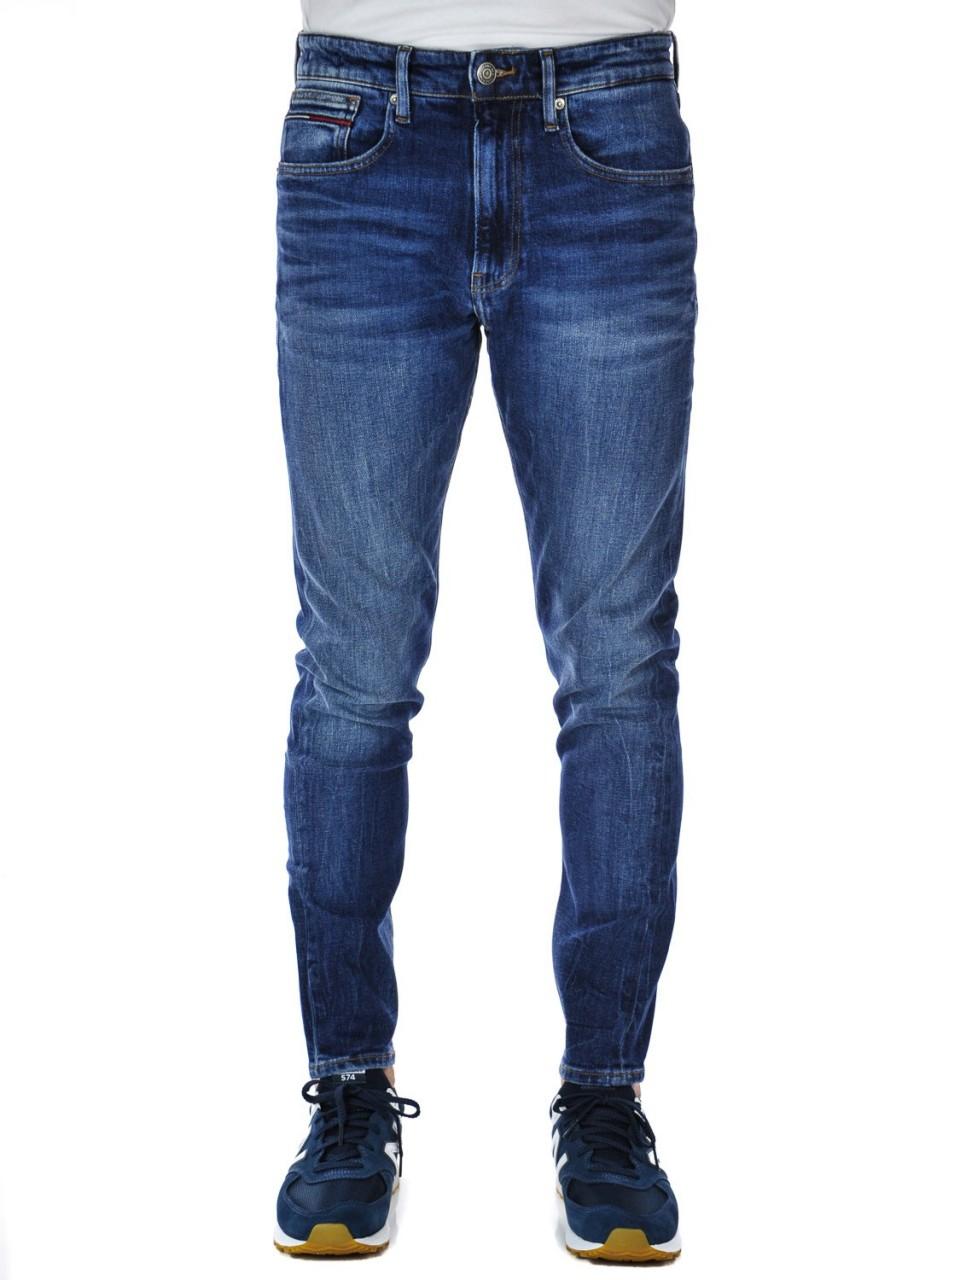 Tommy hilfiger Uomo Jeans Tommy Hilfiger Jeans Uomo Modern Tapered 04625I